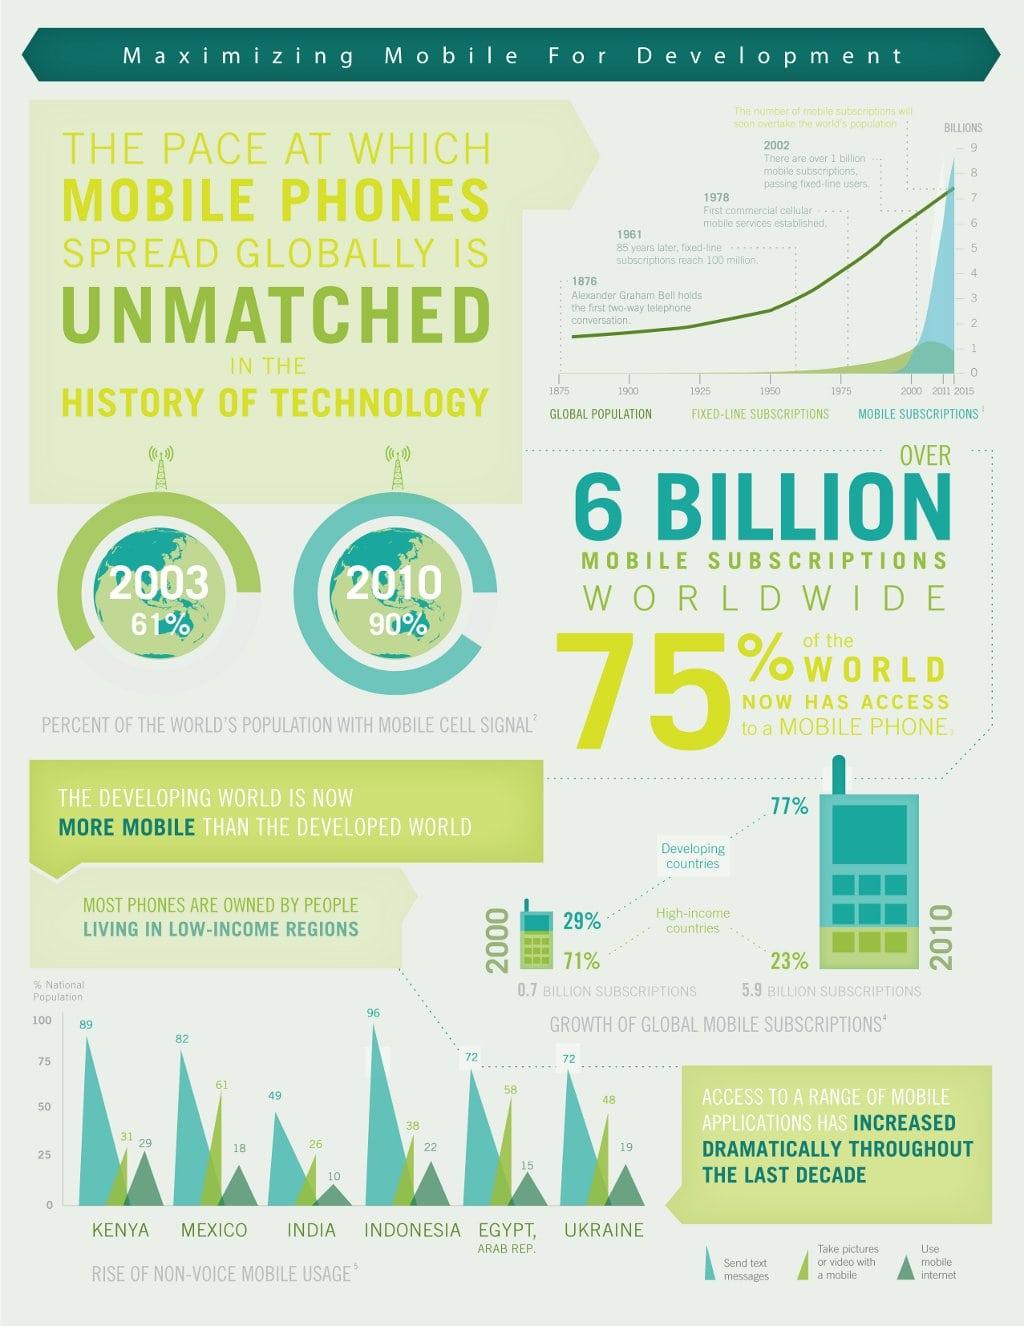 Maximizing Mobile For Development